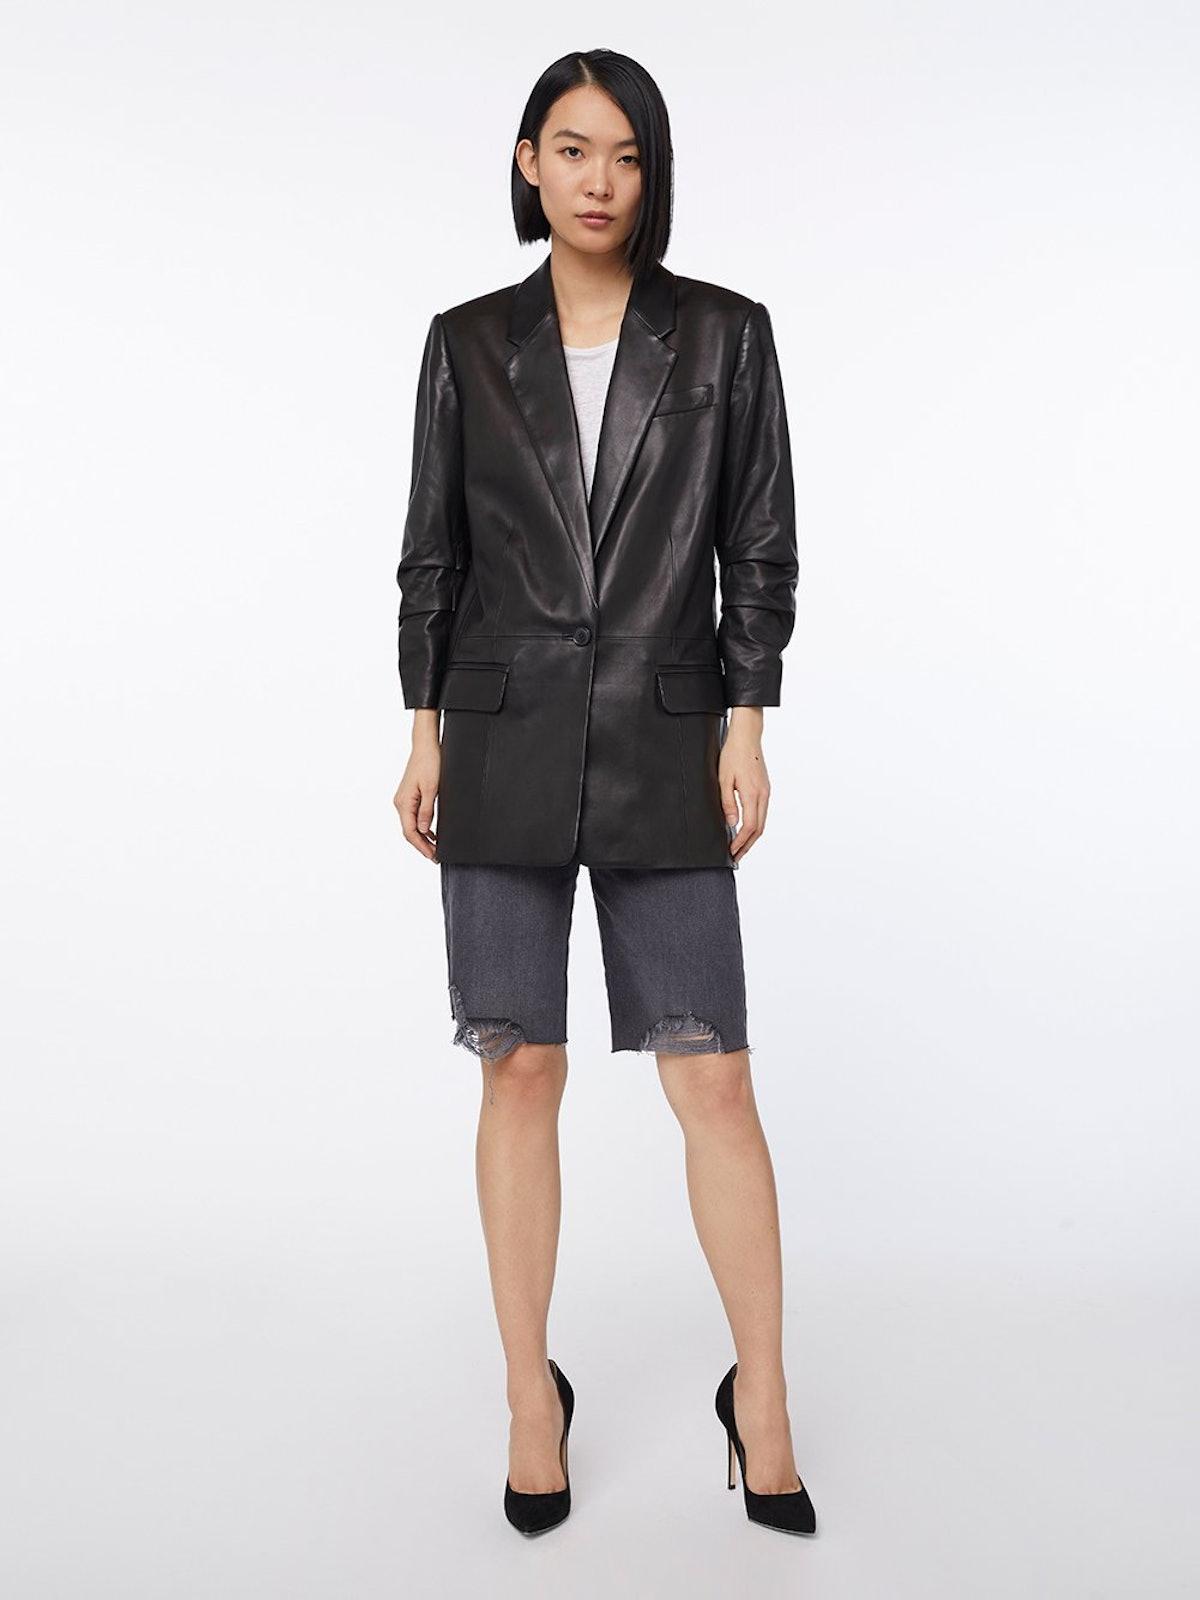 Imaan x FRAME Leather Darted Blazer